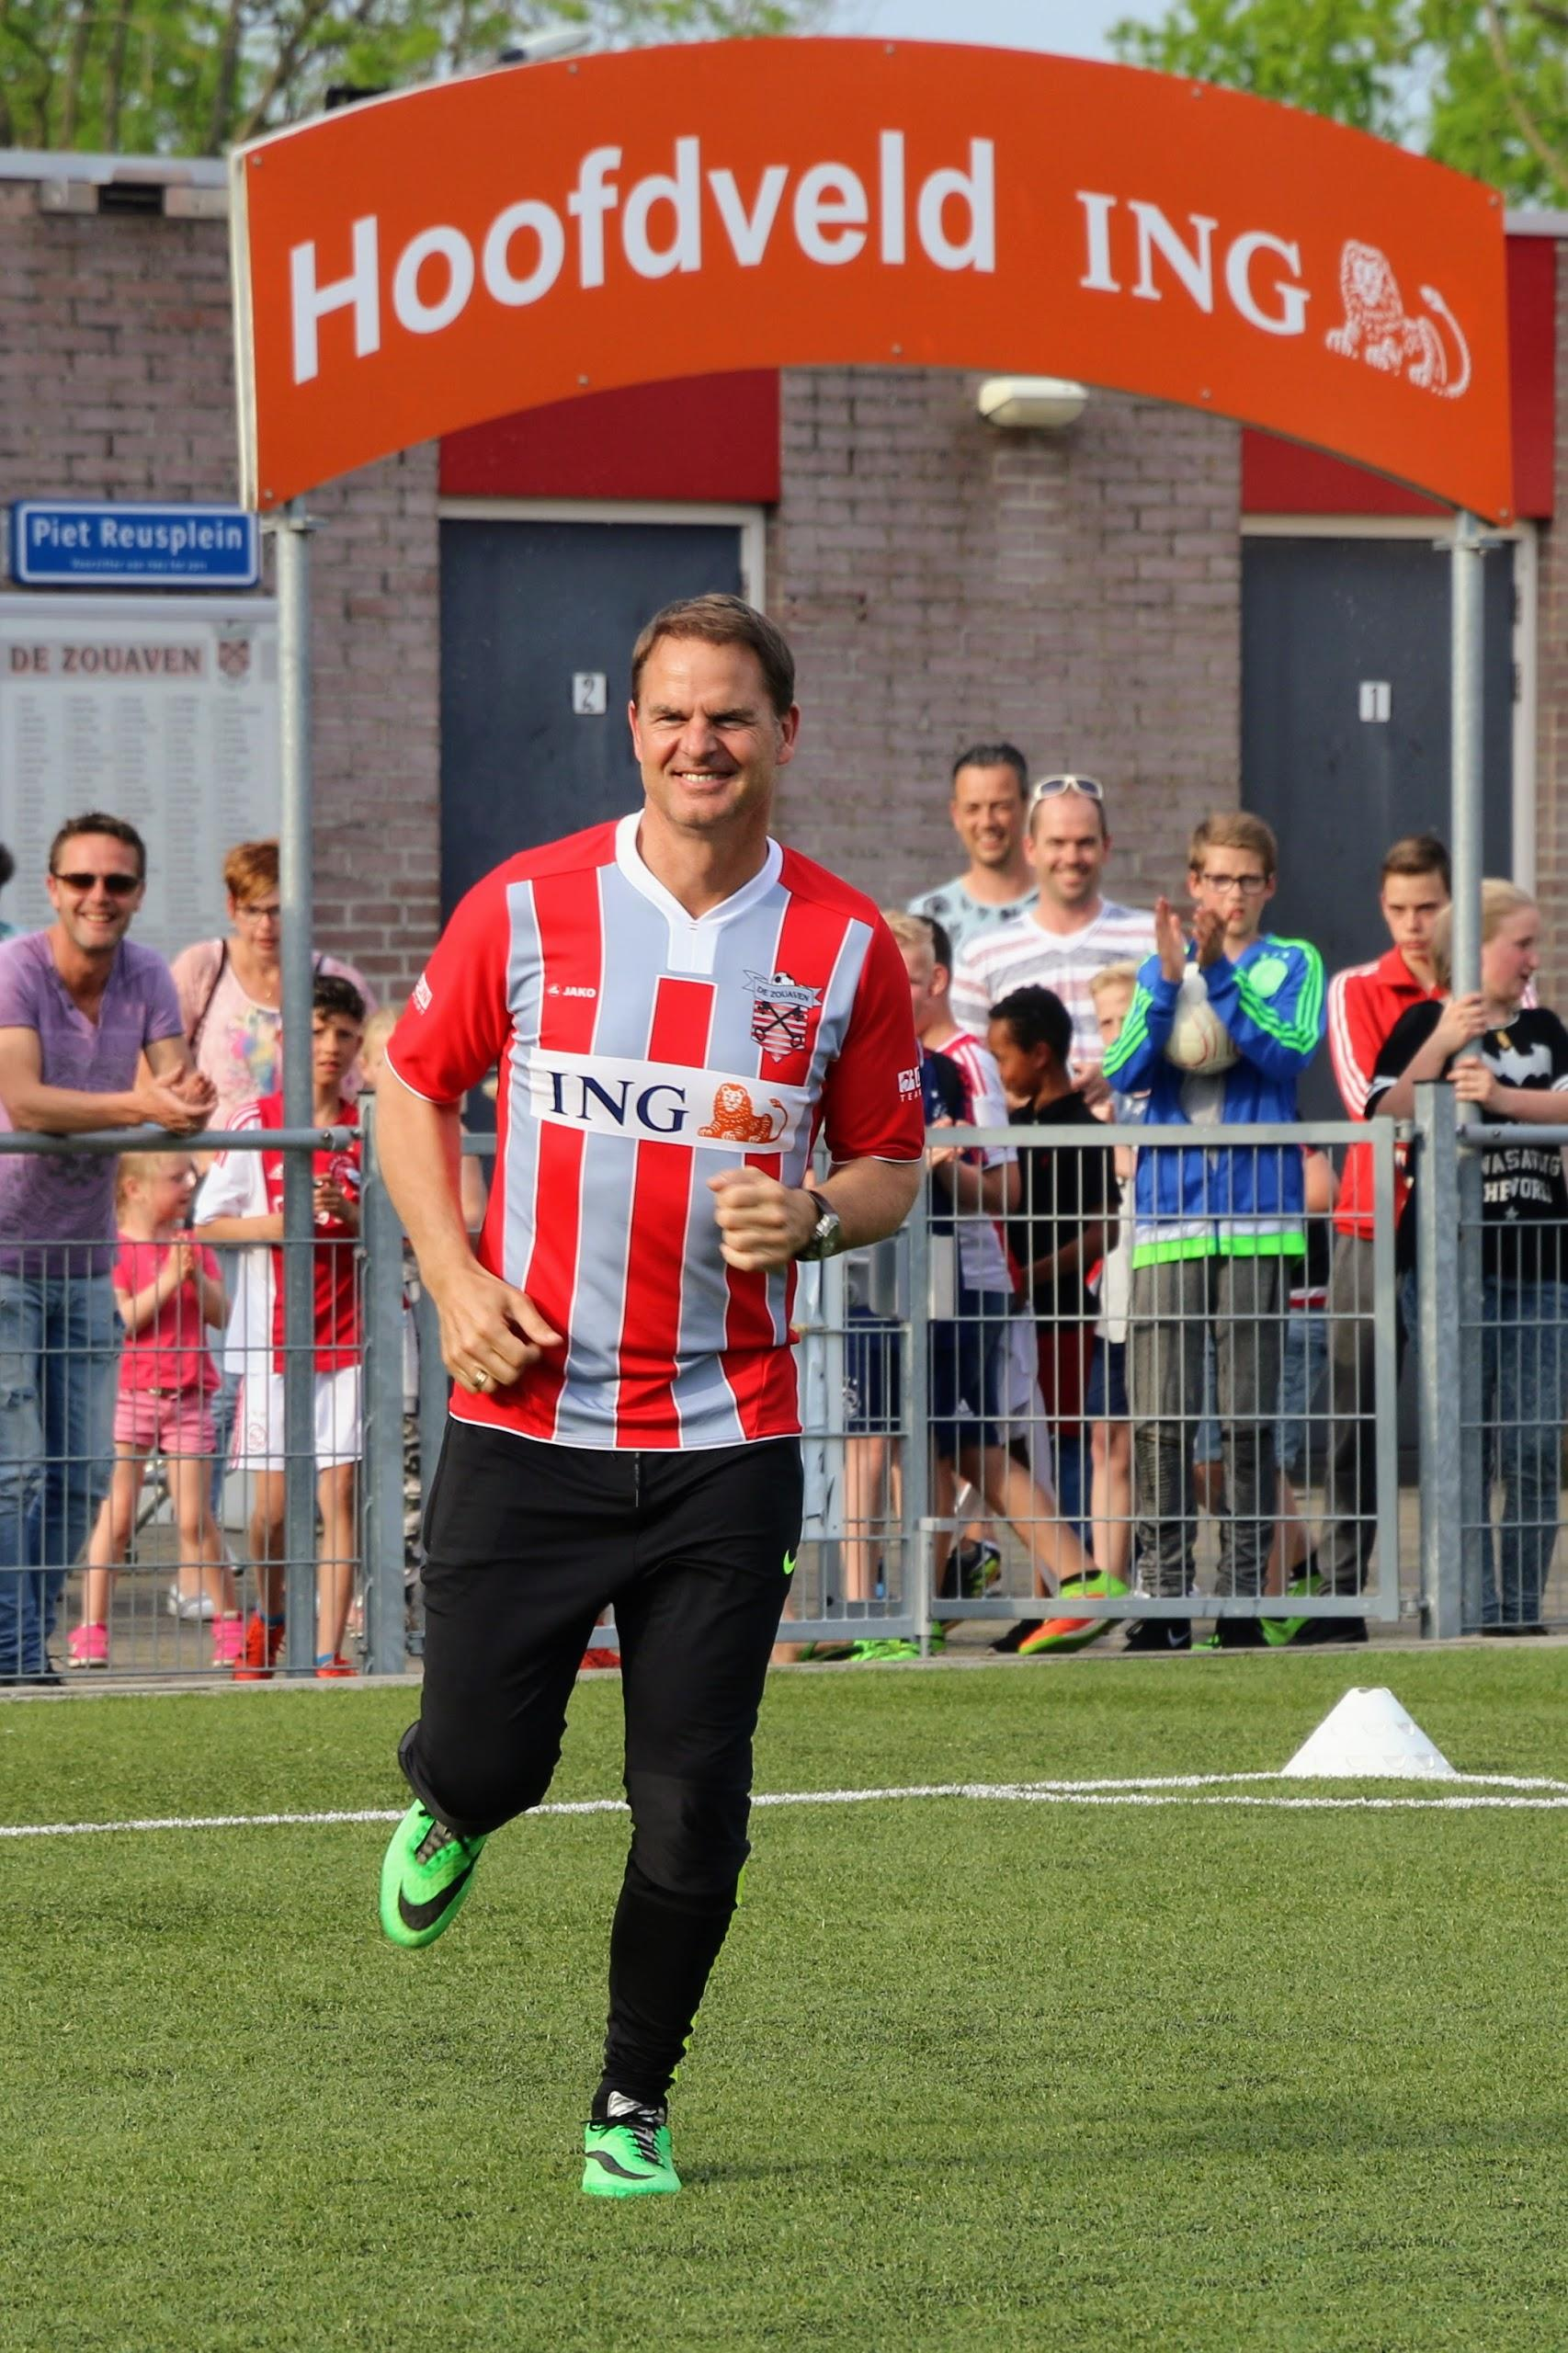 Frank de Boer, van West-Fries boertje tot bondscoach: 'Je zat nooit ontspannen te kaarten met Frank. De he-le tijd moest je opletten'